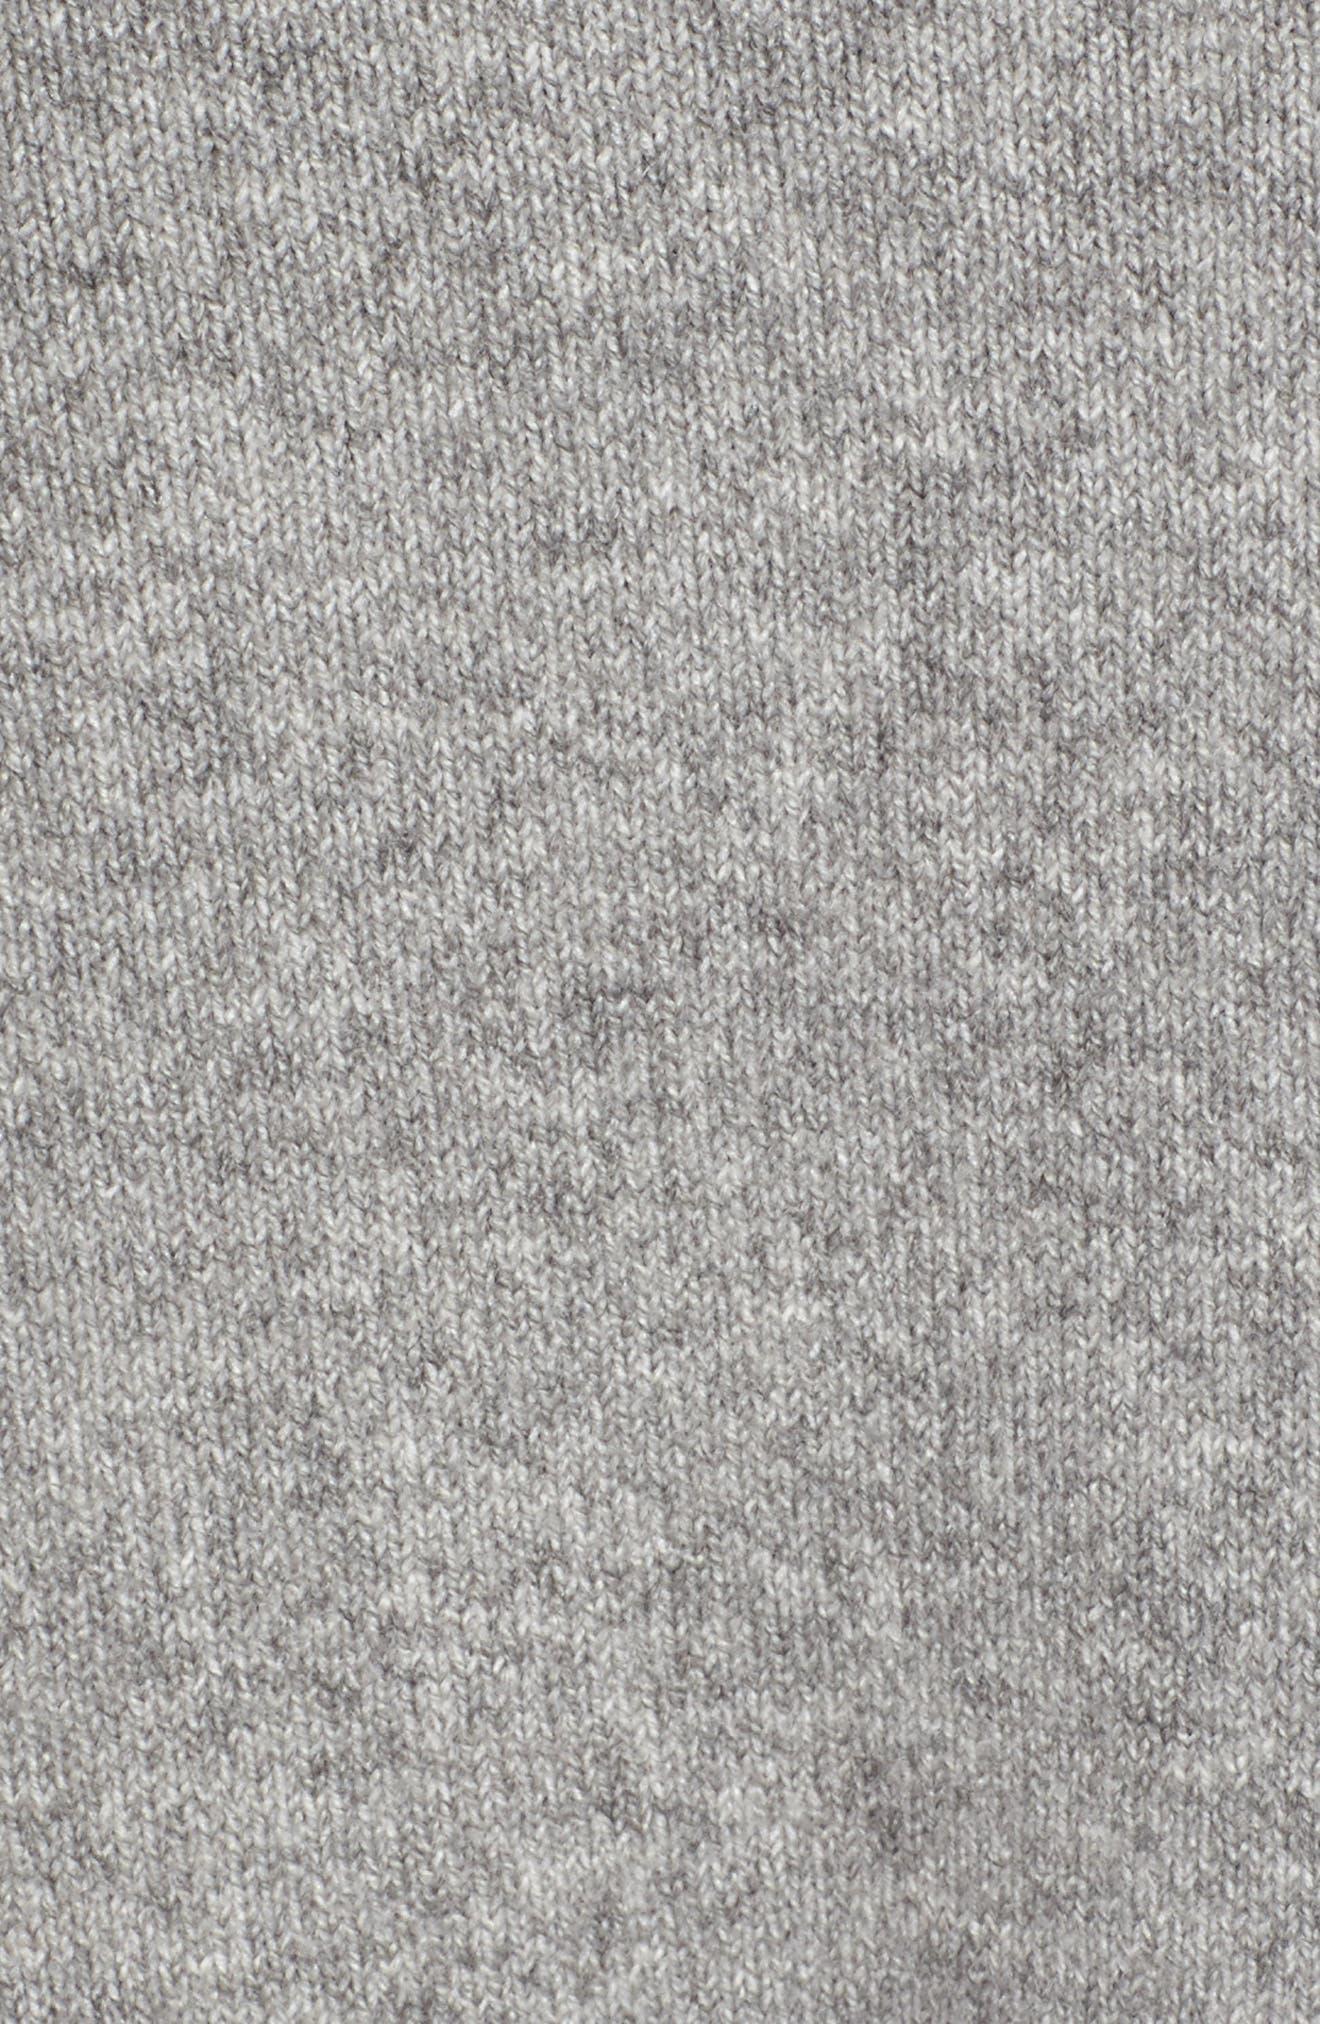 Flare Sleeve Track Jacket,                             Alternate thumbnail 5, color,                             Grey Heather